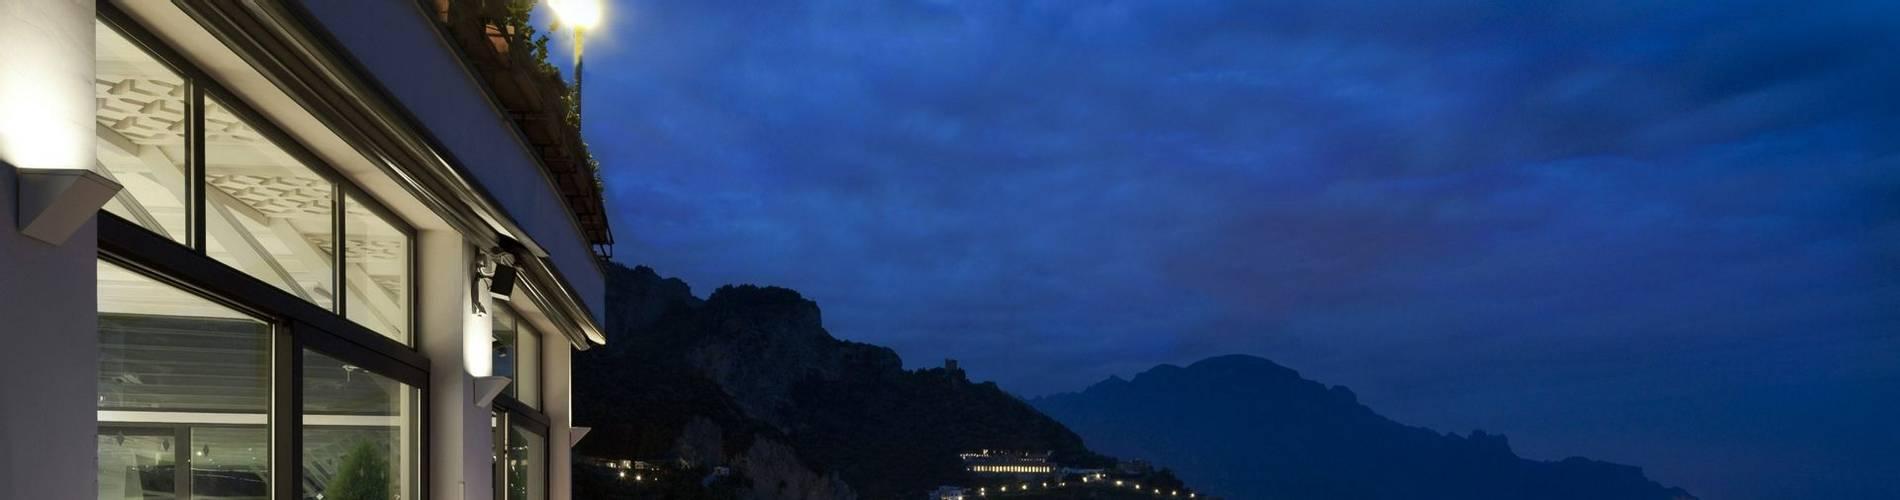 Miramalfi, Amalfi Coast, Italy (26).jpg